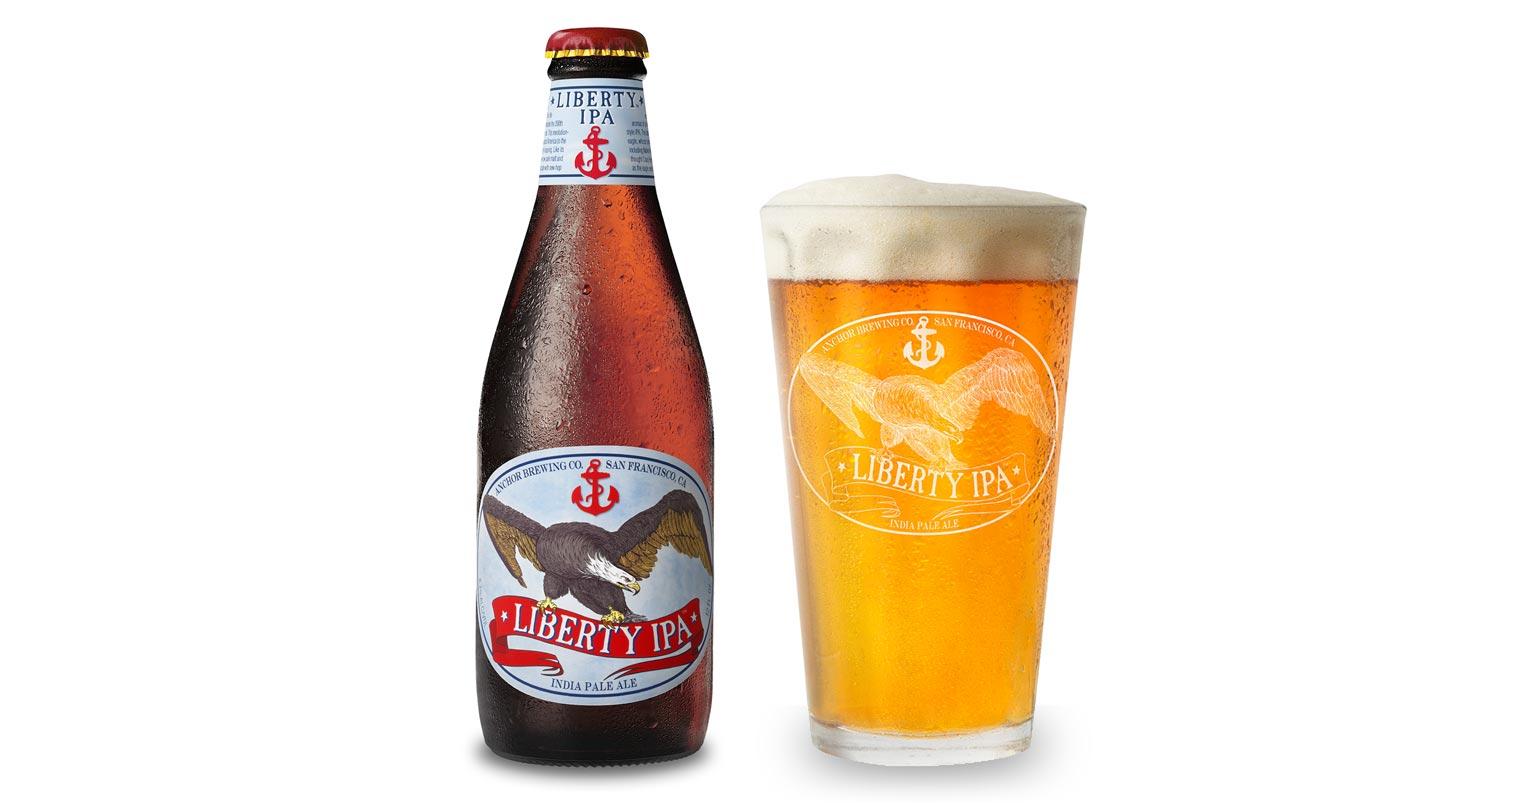 Liberty Ale American Pale Ale